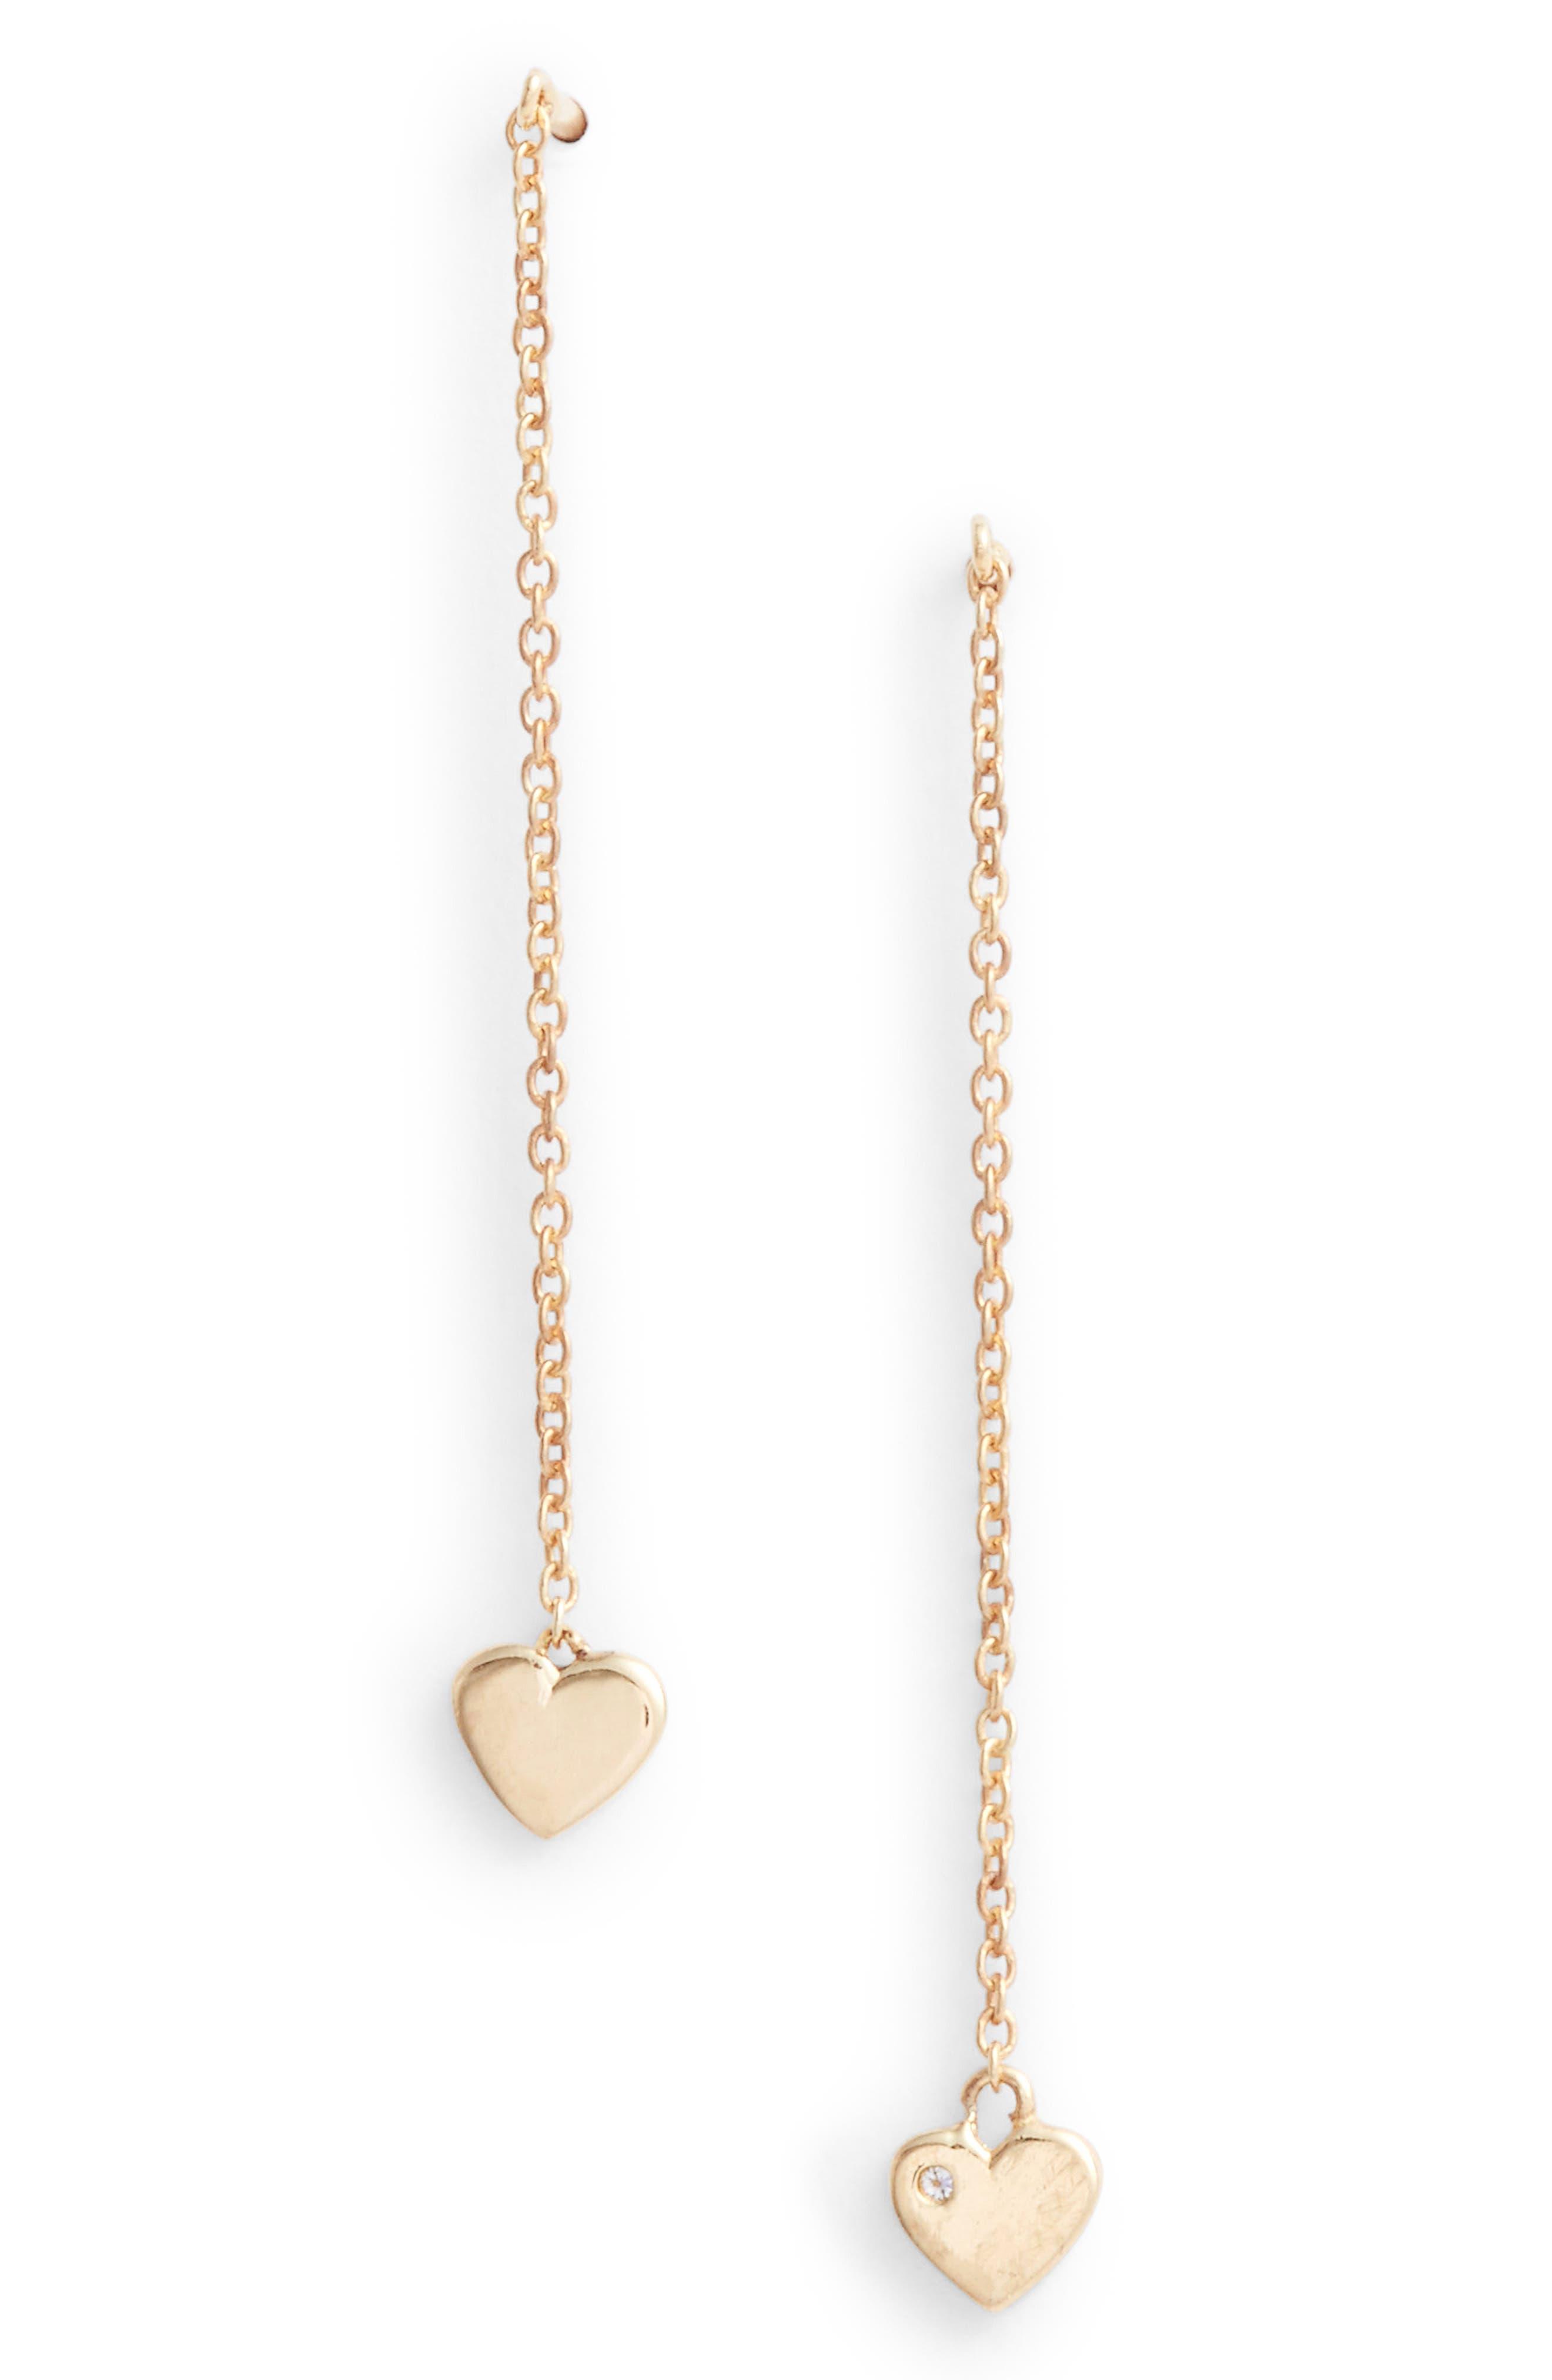 Heart Threader Earrings,                         Main,                         color, Gold